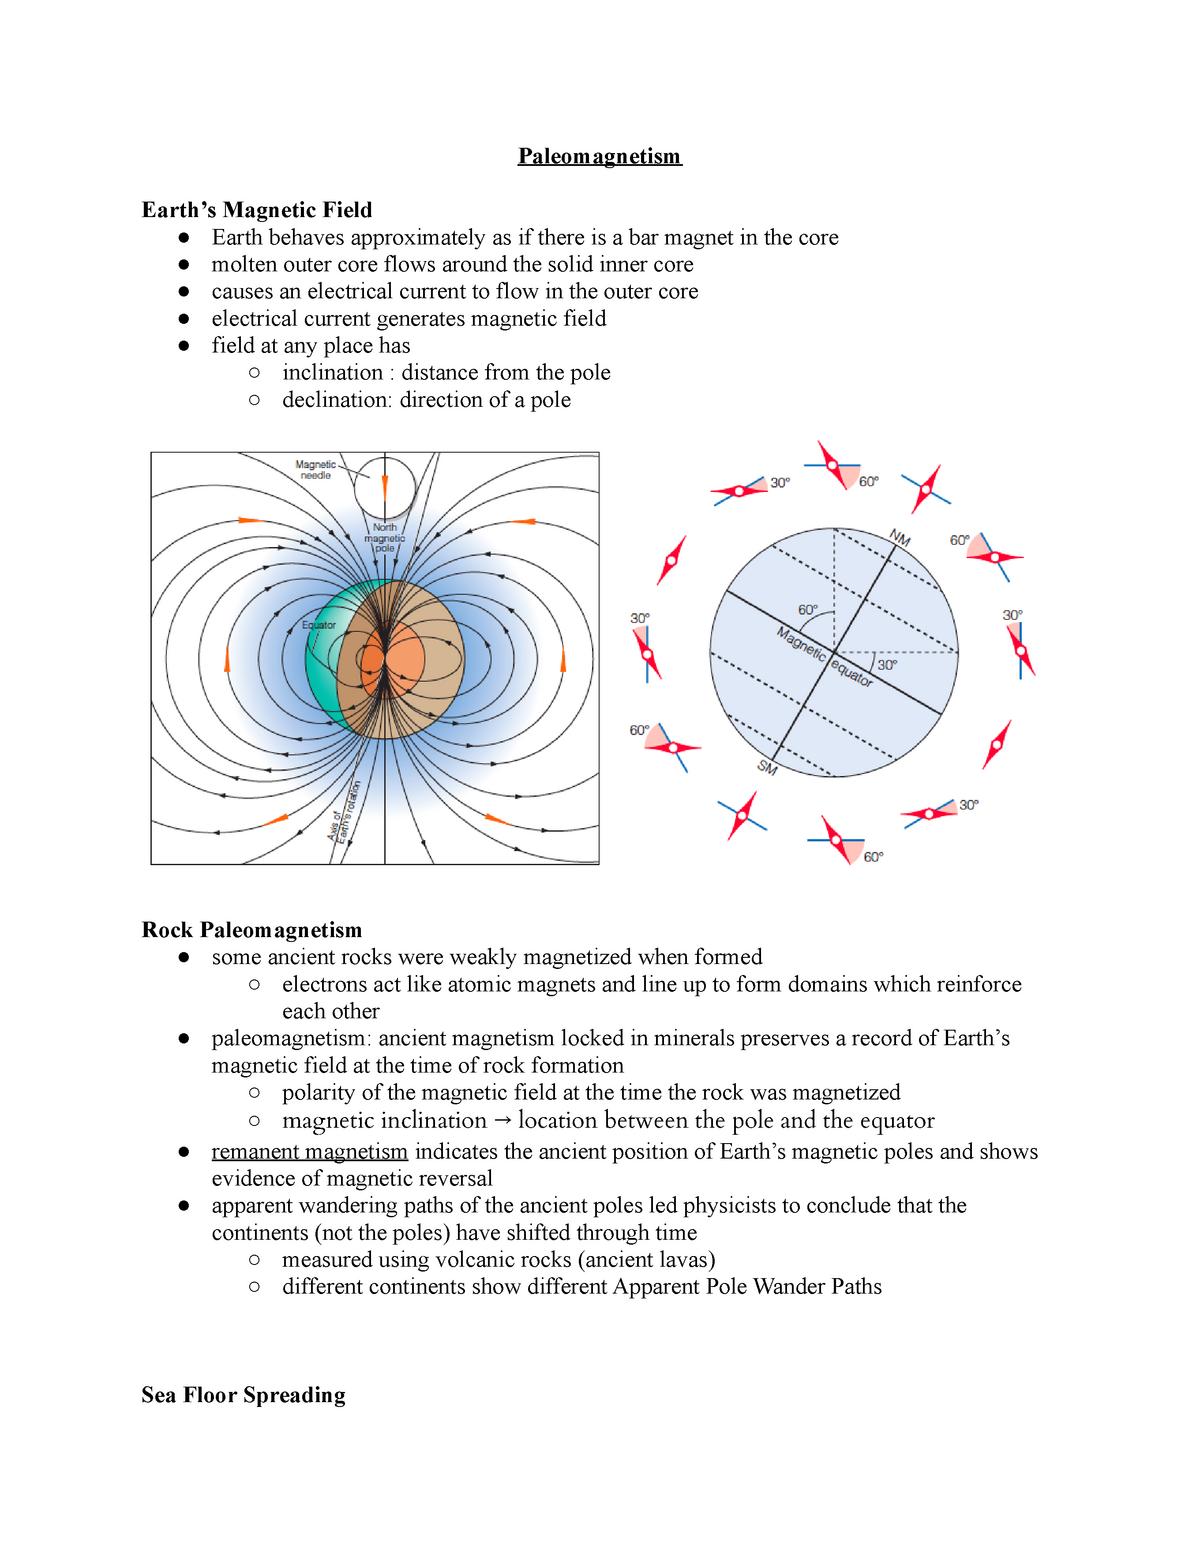 16  Paleomagnetism - Eas100: Planet Earth - StuDocu